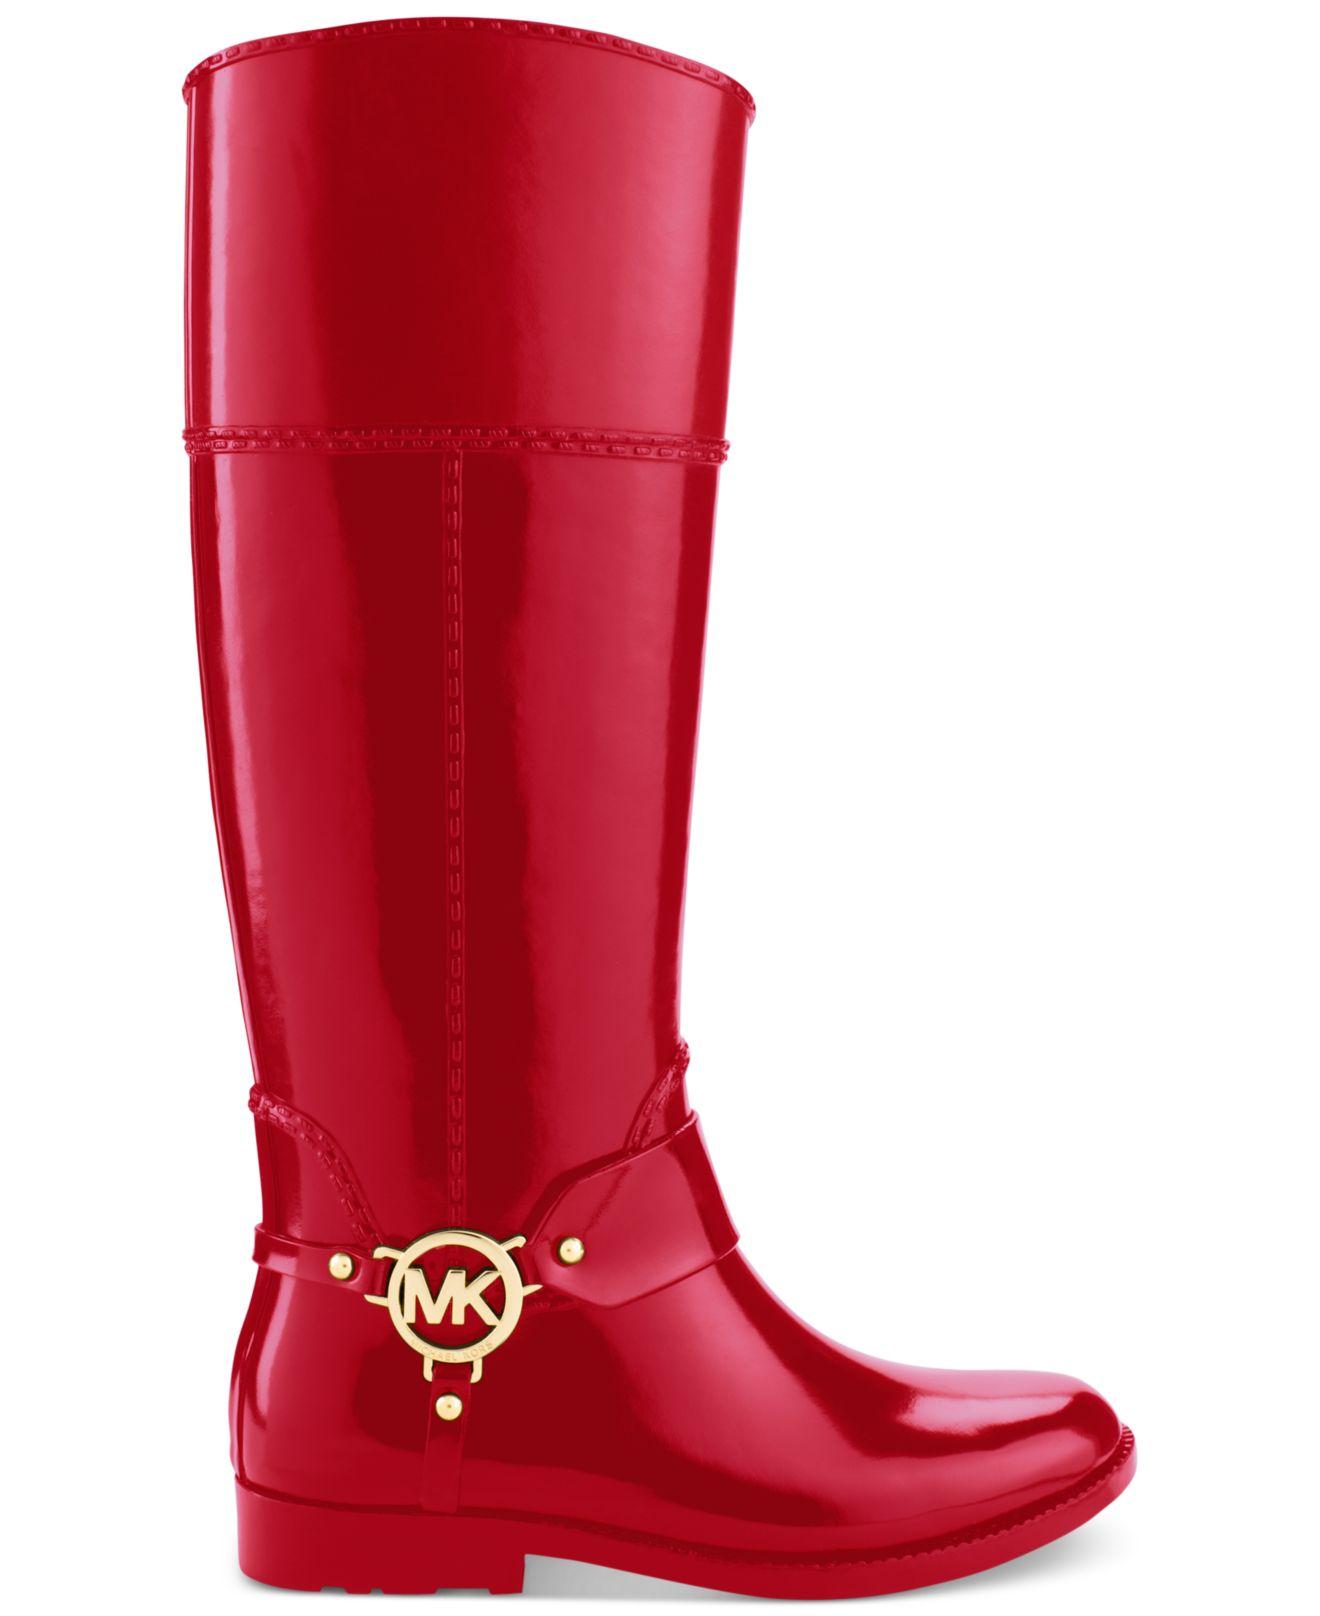 Michael kors Michael Fulton Harness Rain Boots in Red | Lyst